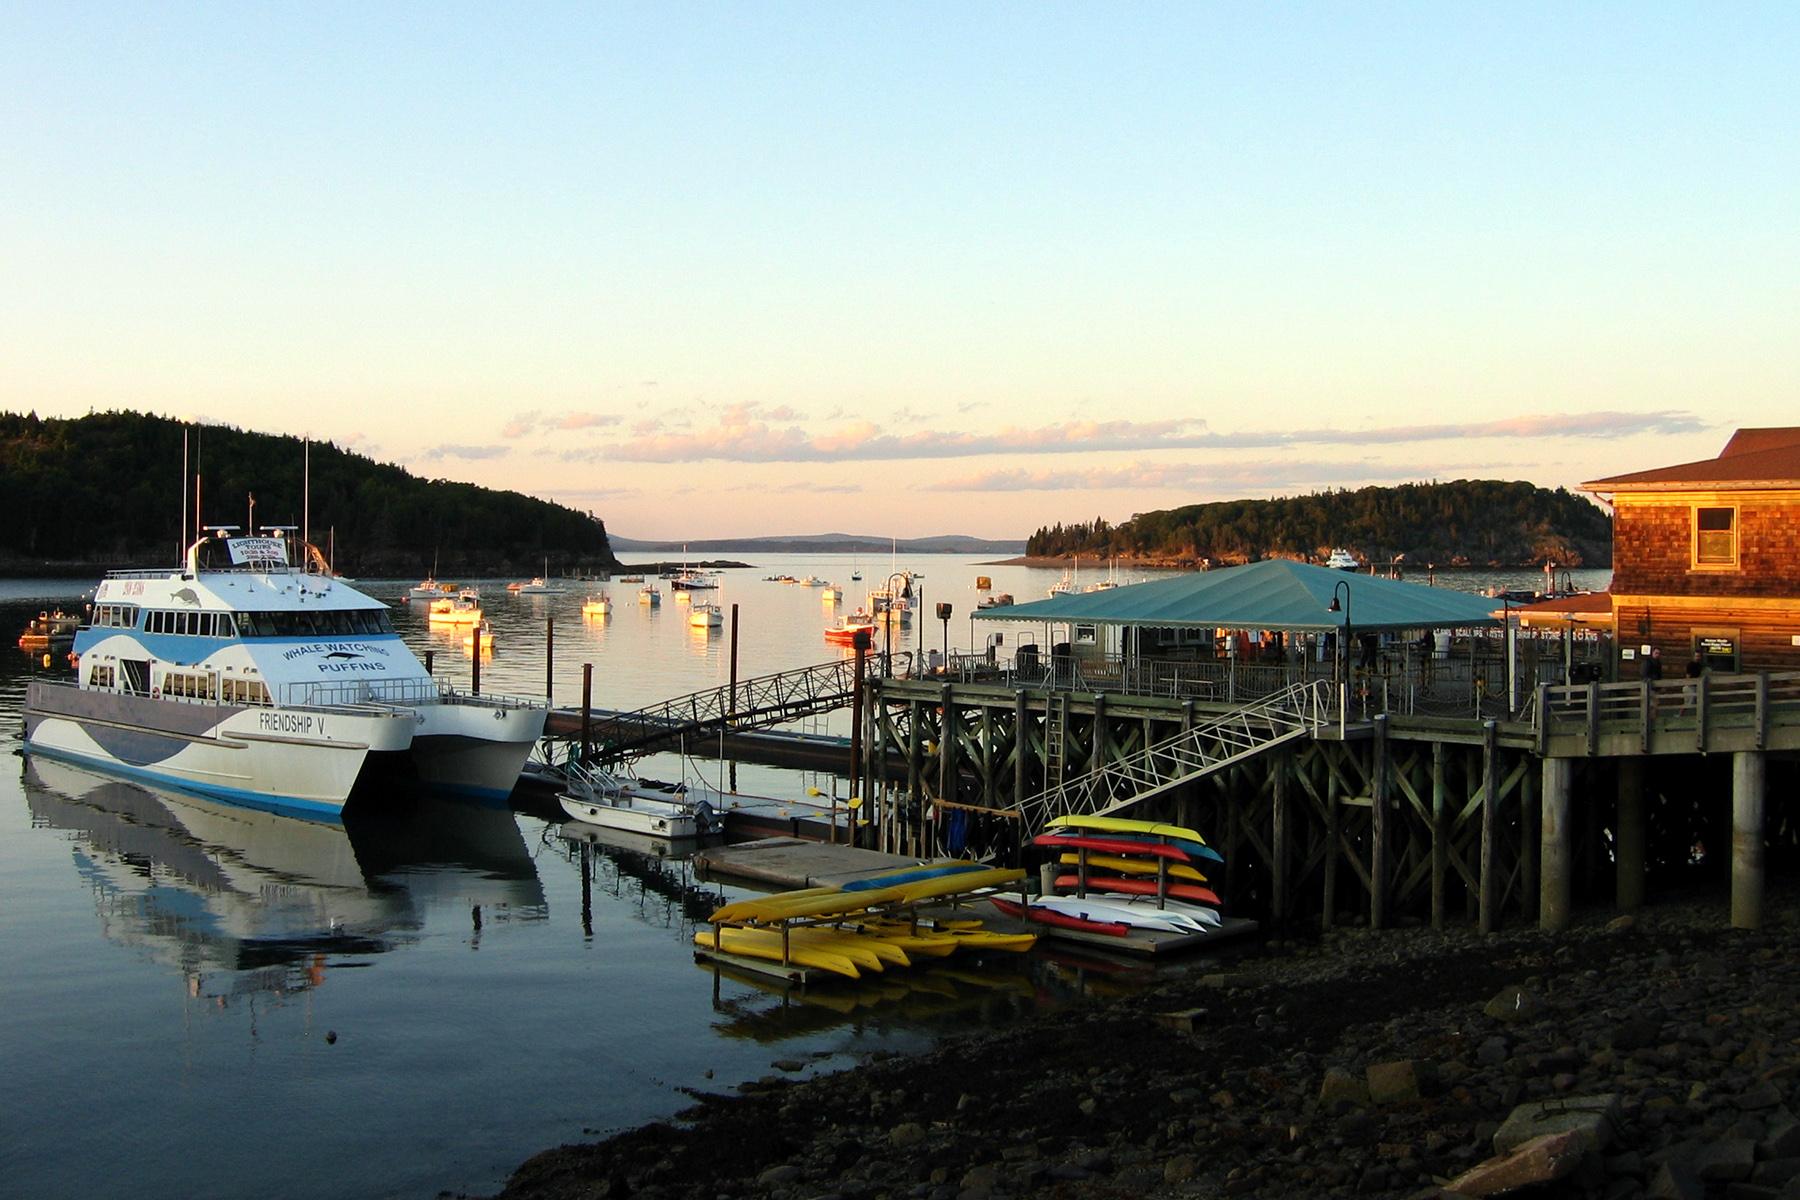 Bar Harbor, Maine Cruise Port - Cruiseline.com